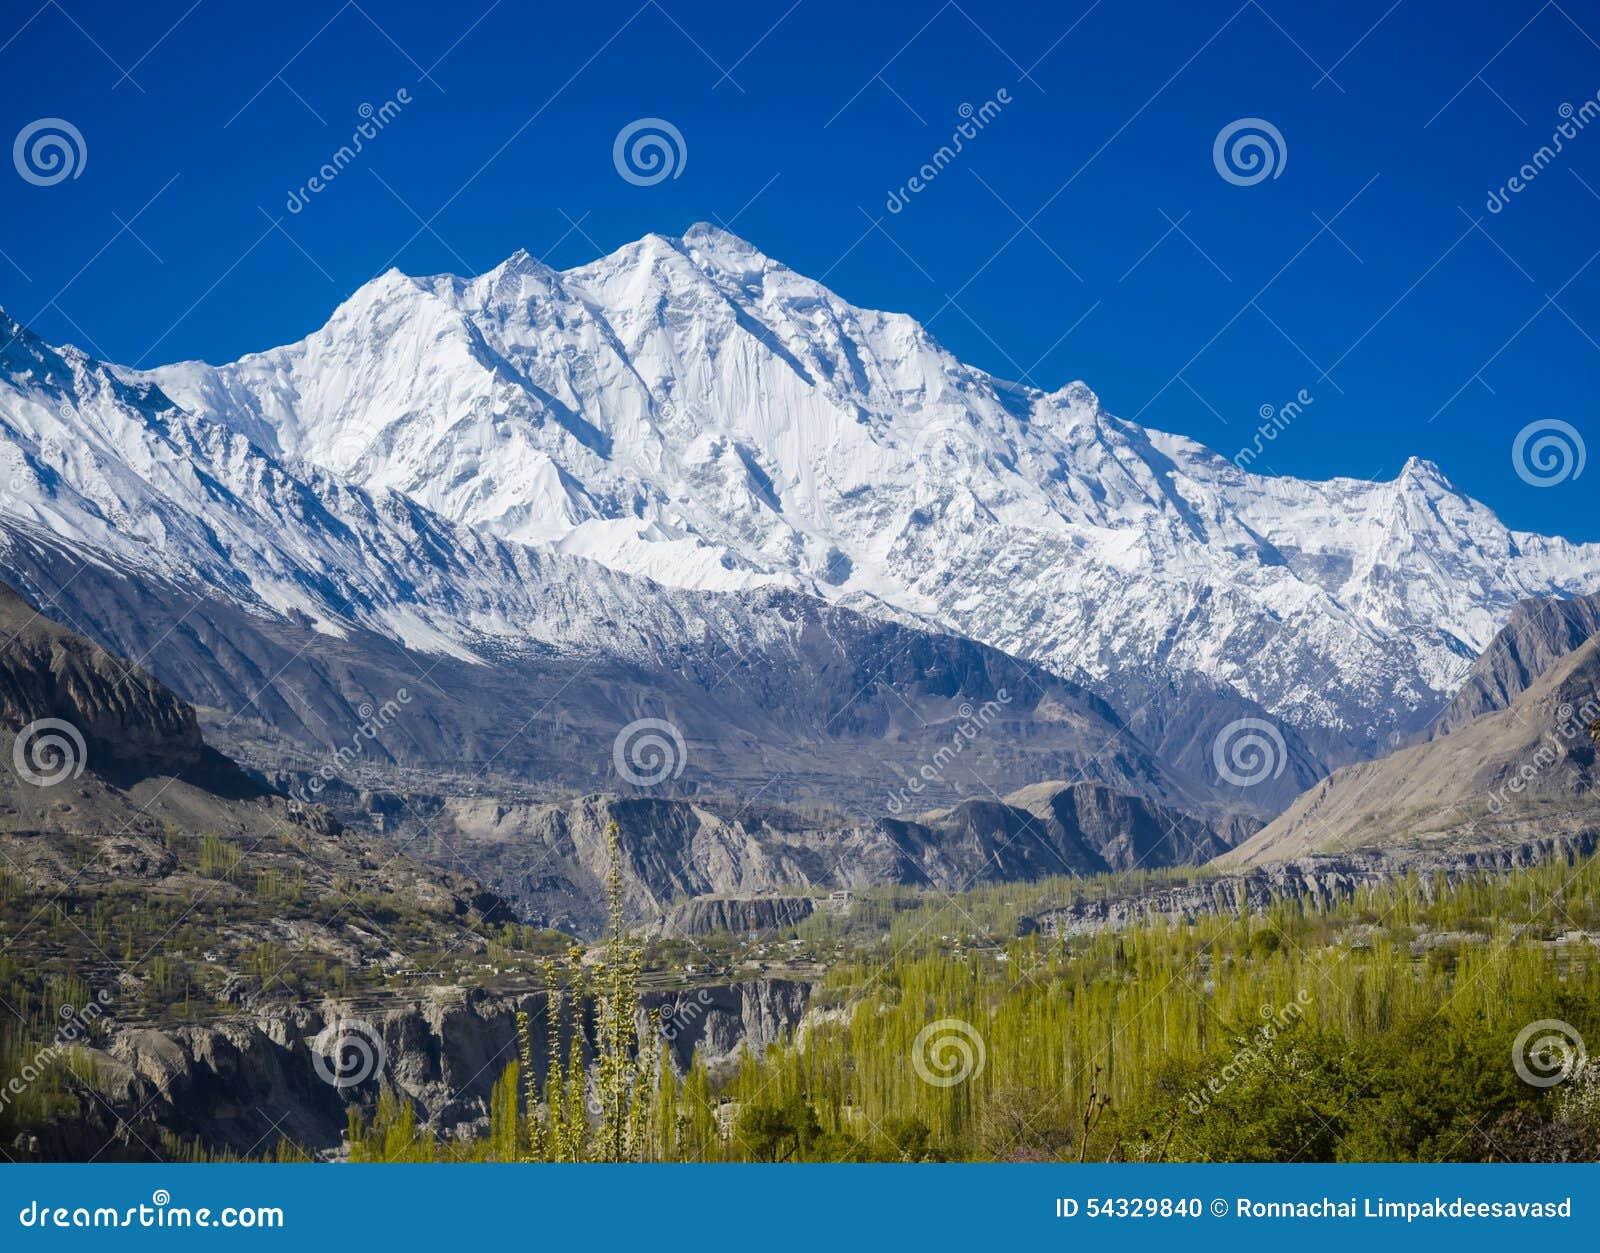 Vallée idyllique de montagne